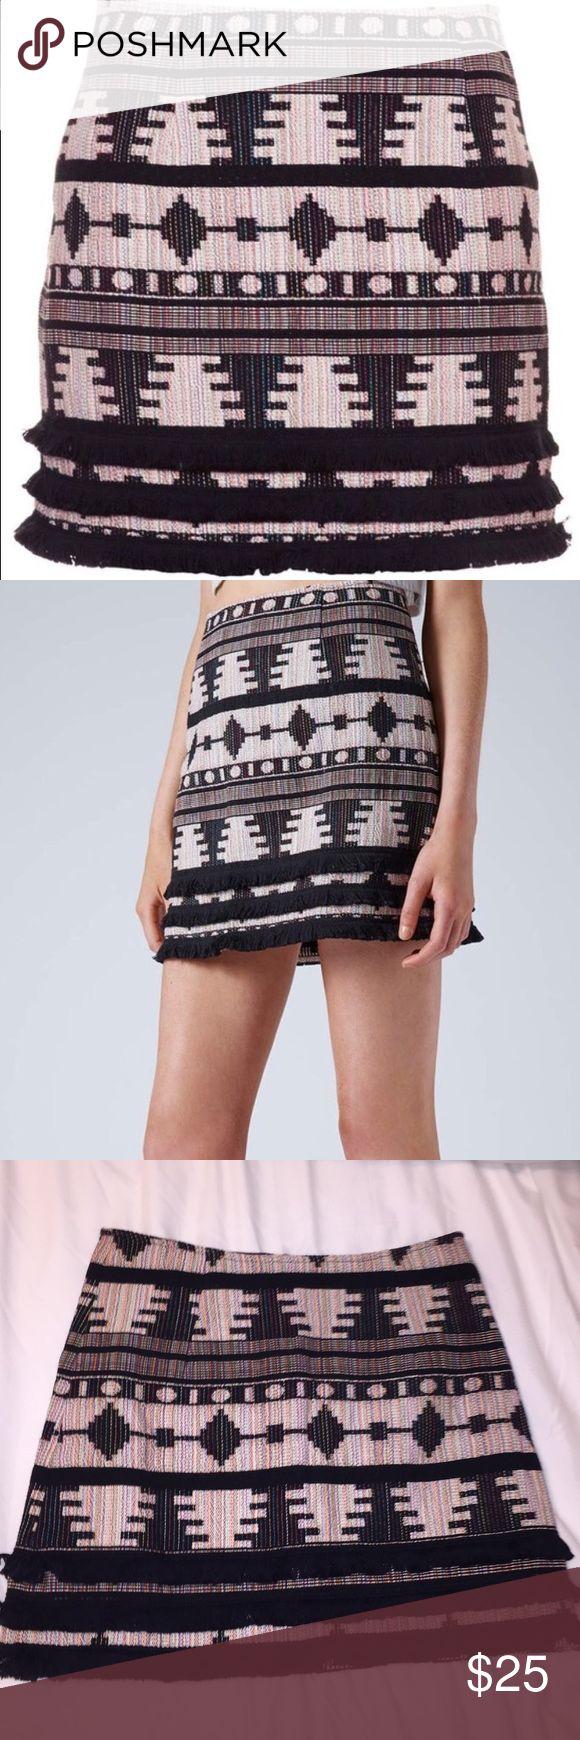 NWT Topshop skirt! Brand new Aztec print with black fringe detail Topshop Skirts Mini